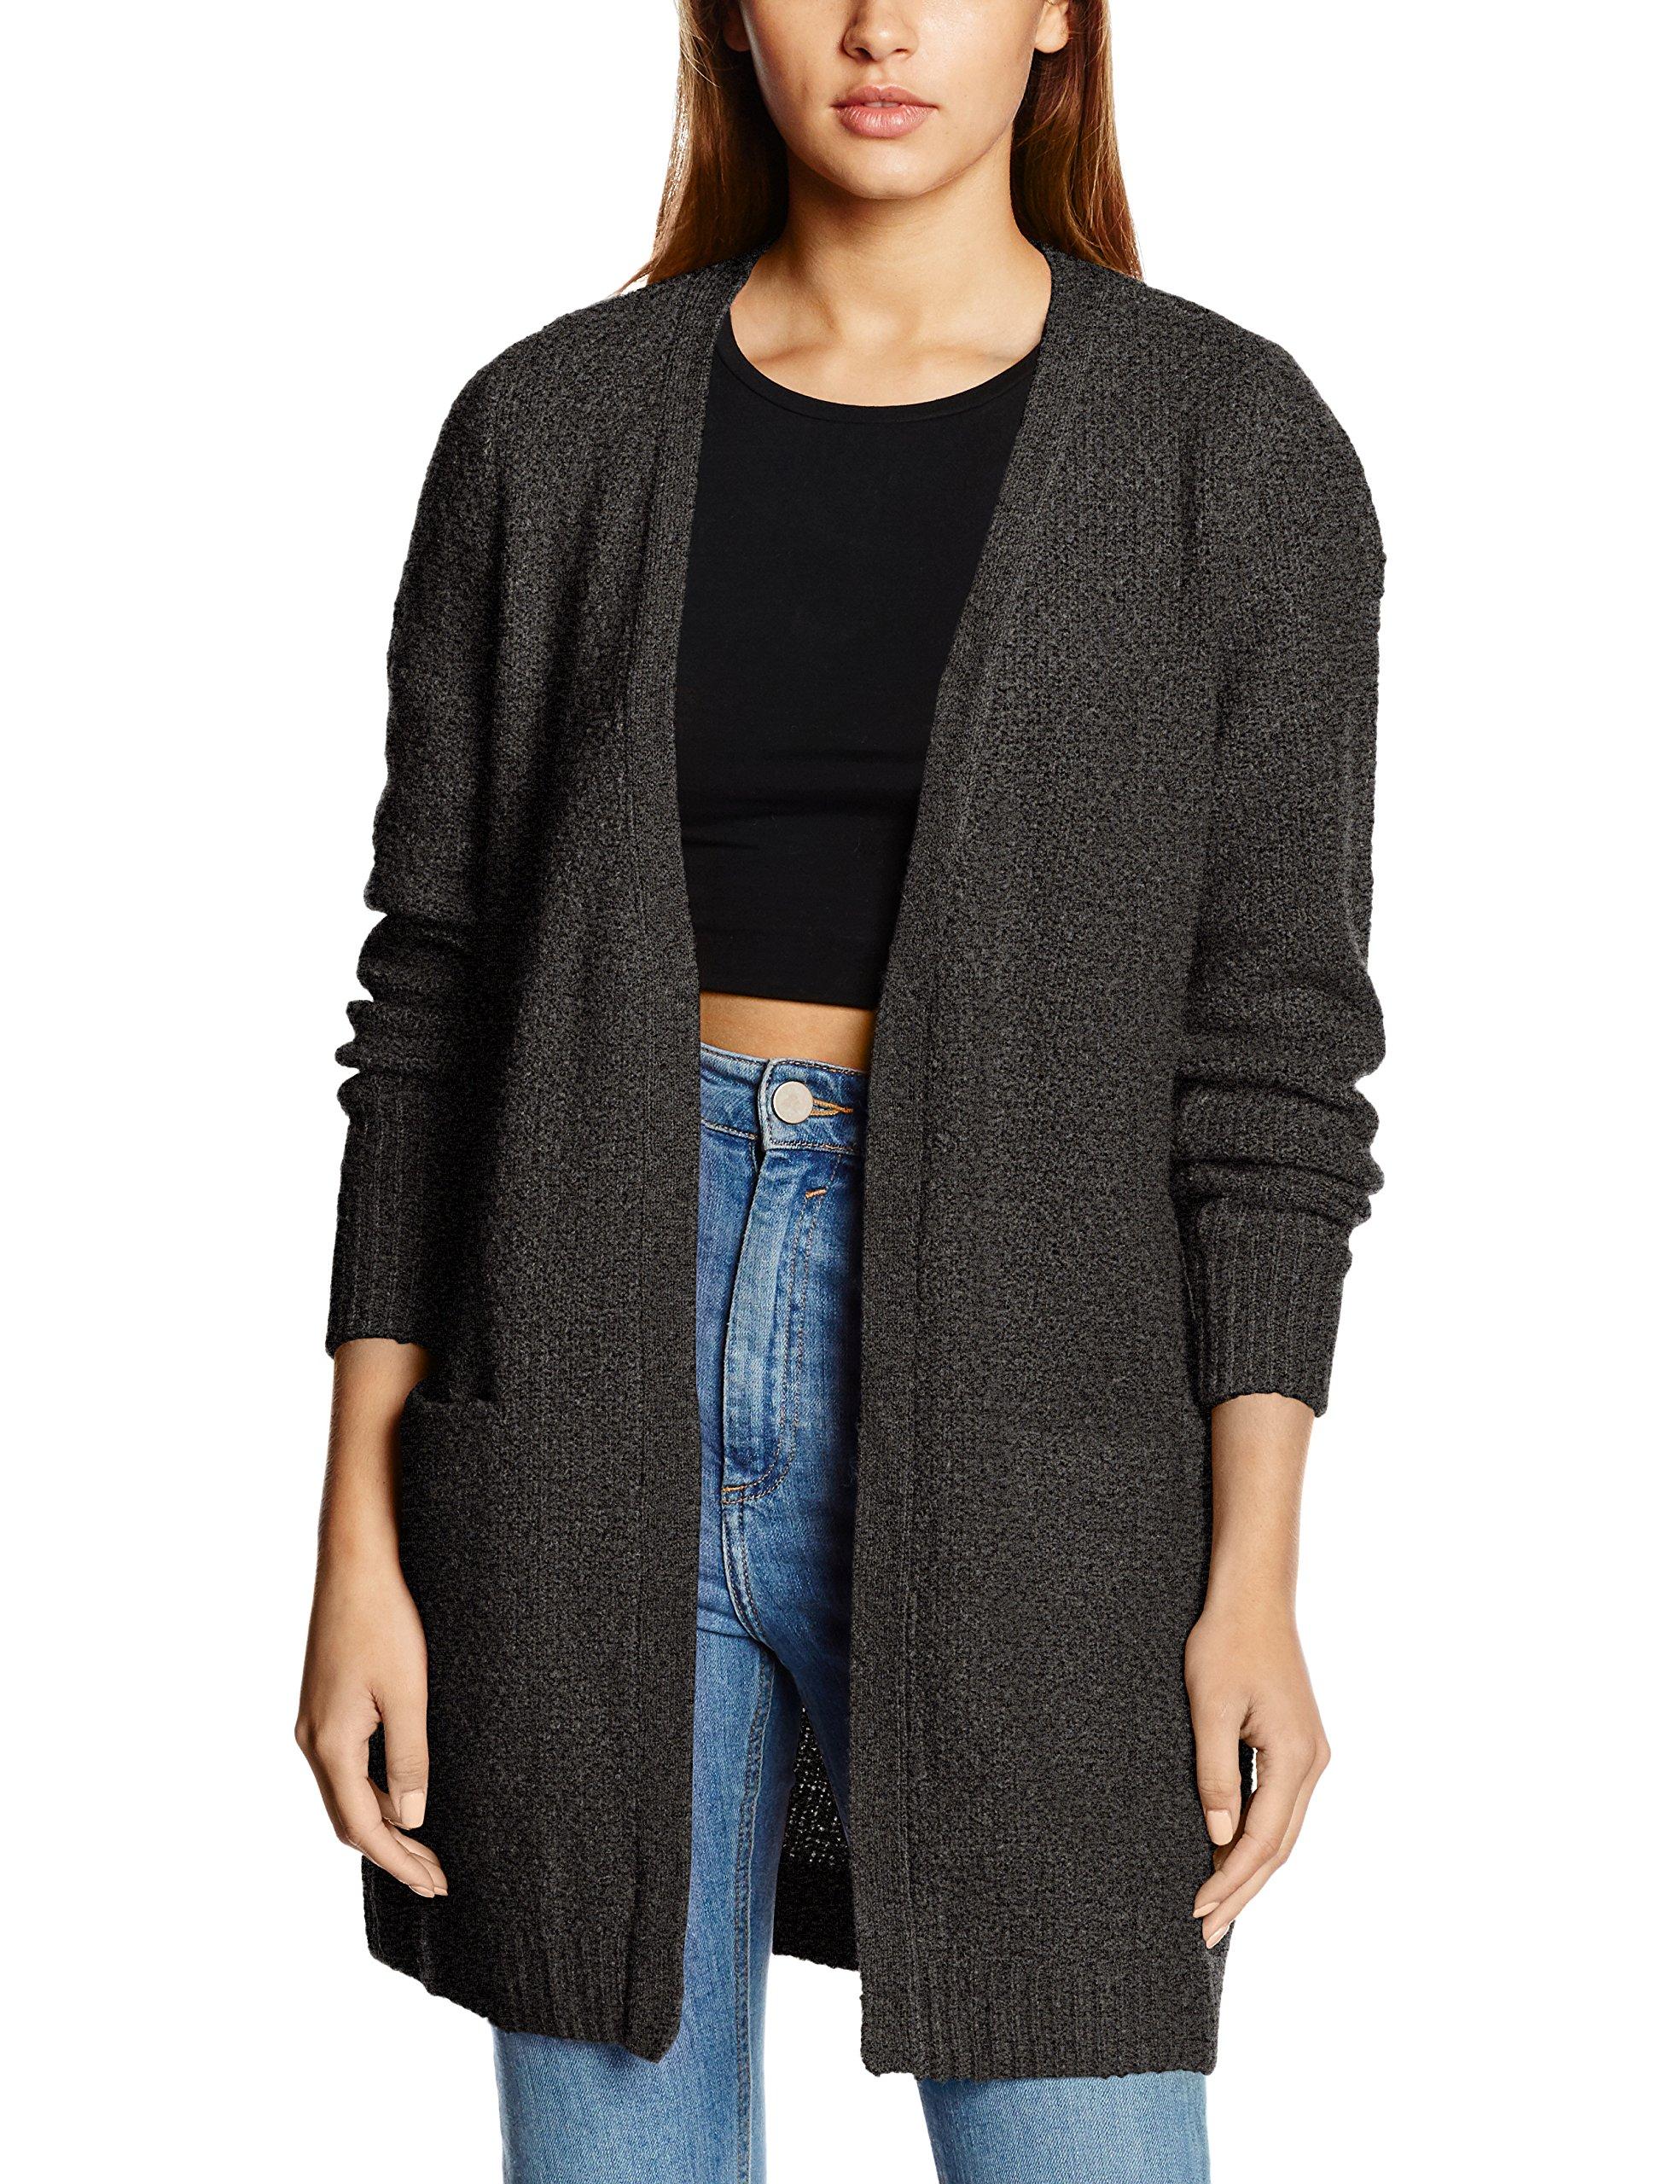 FemmeGrisdark Melange40taille Vila noosGilet Clothes Viplace FabricantLarge Grey Cardigan Knit Xw0kN8OPn